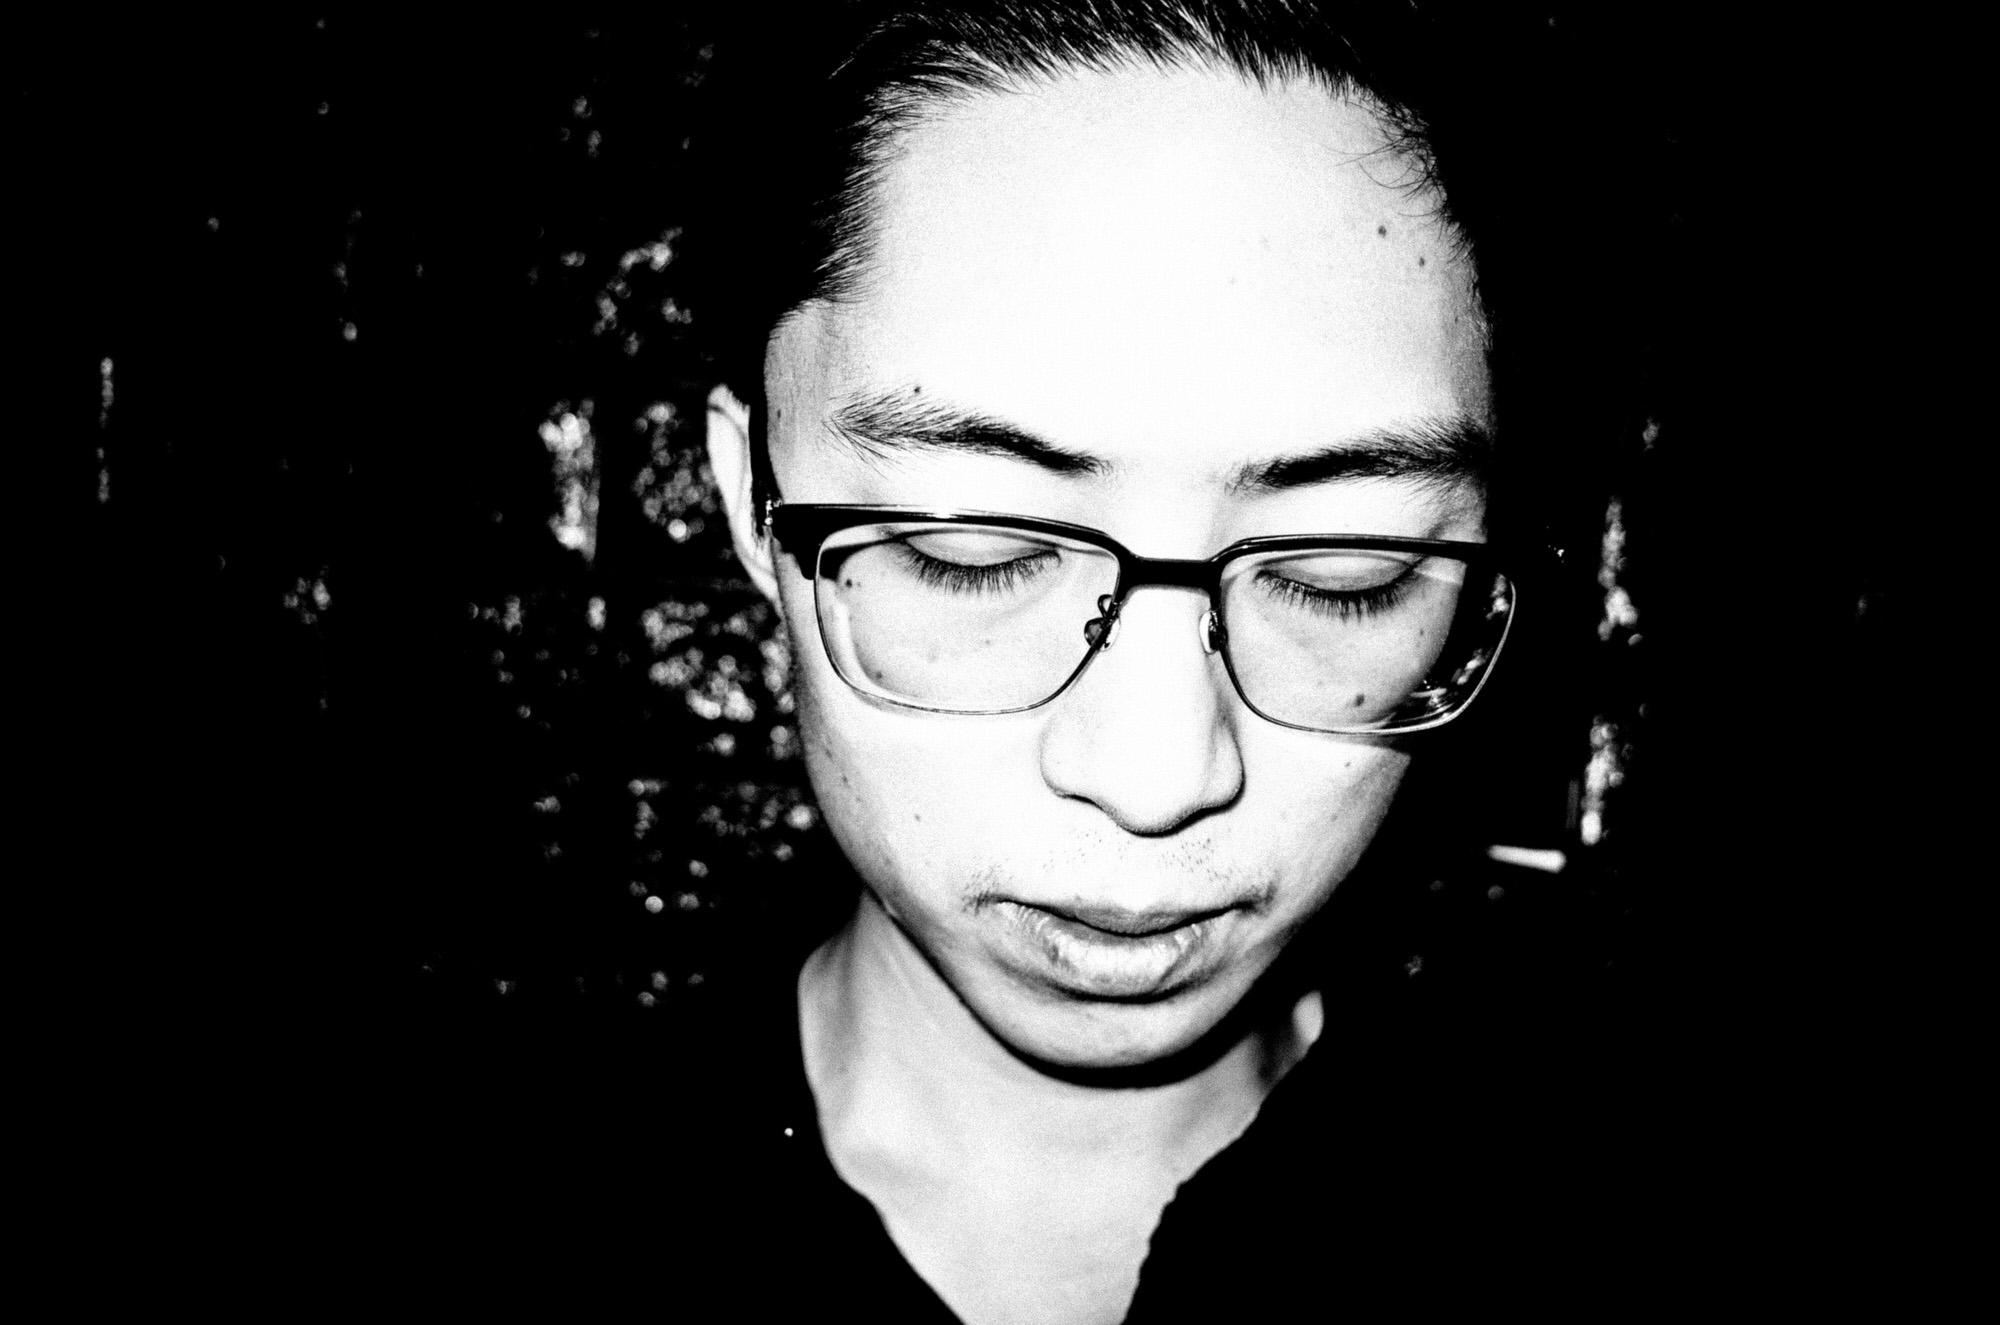 eric kim photography black and white hanoi-0009770-self portrait - looking down.jpg